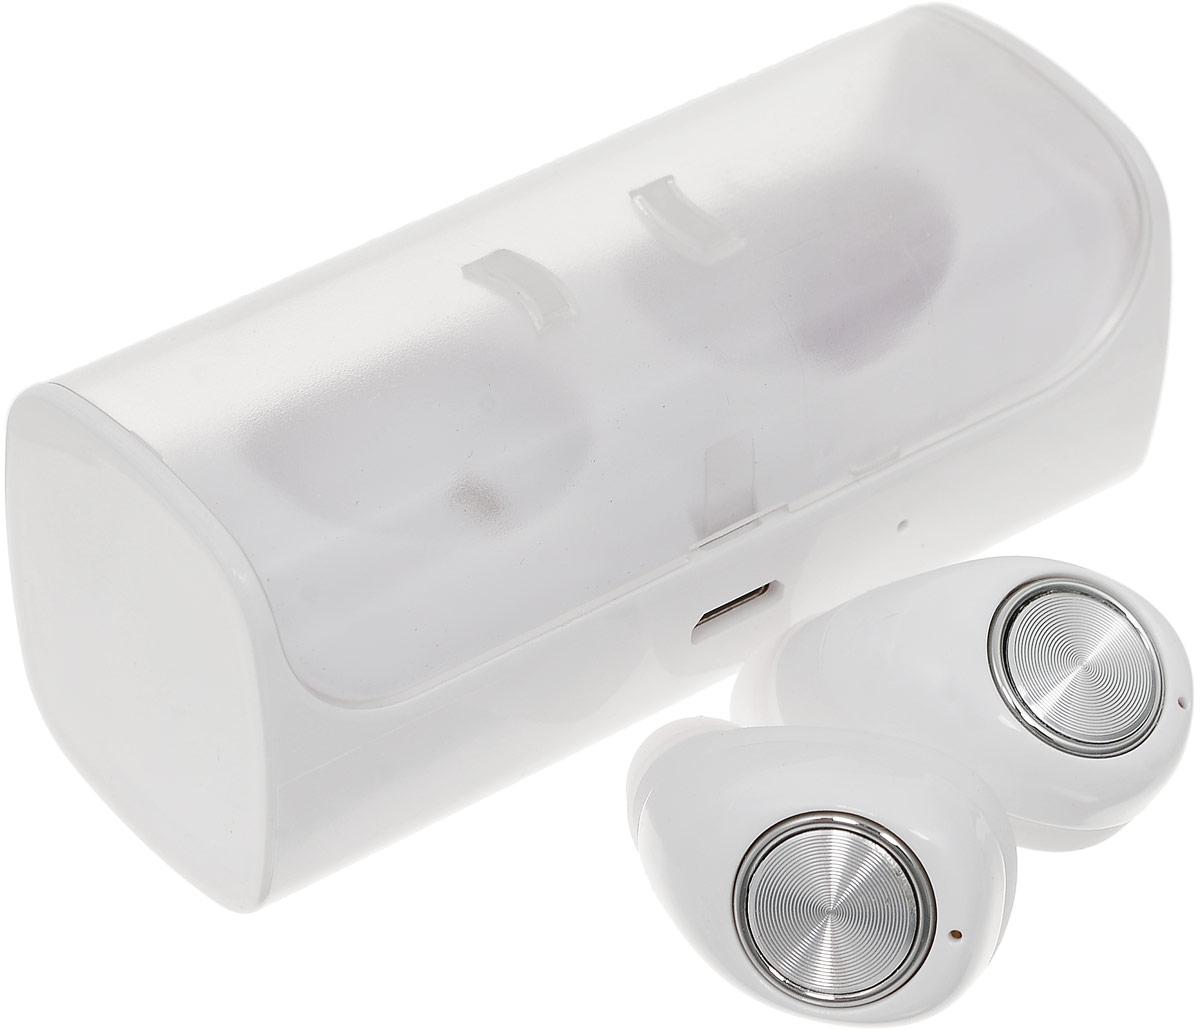 Mettle TWS-10, White Silver беспроводные наушники - Bluetooth-гарнитуры